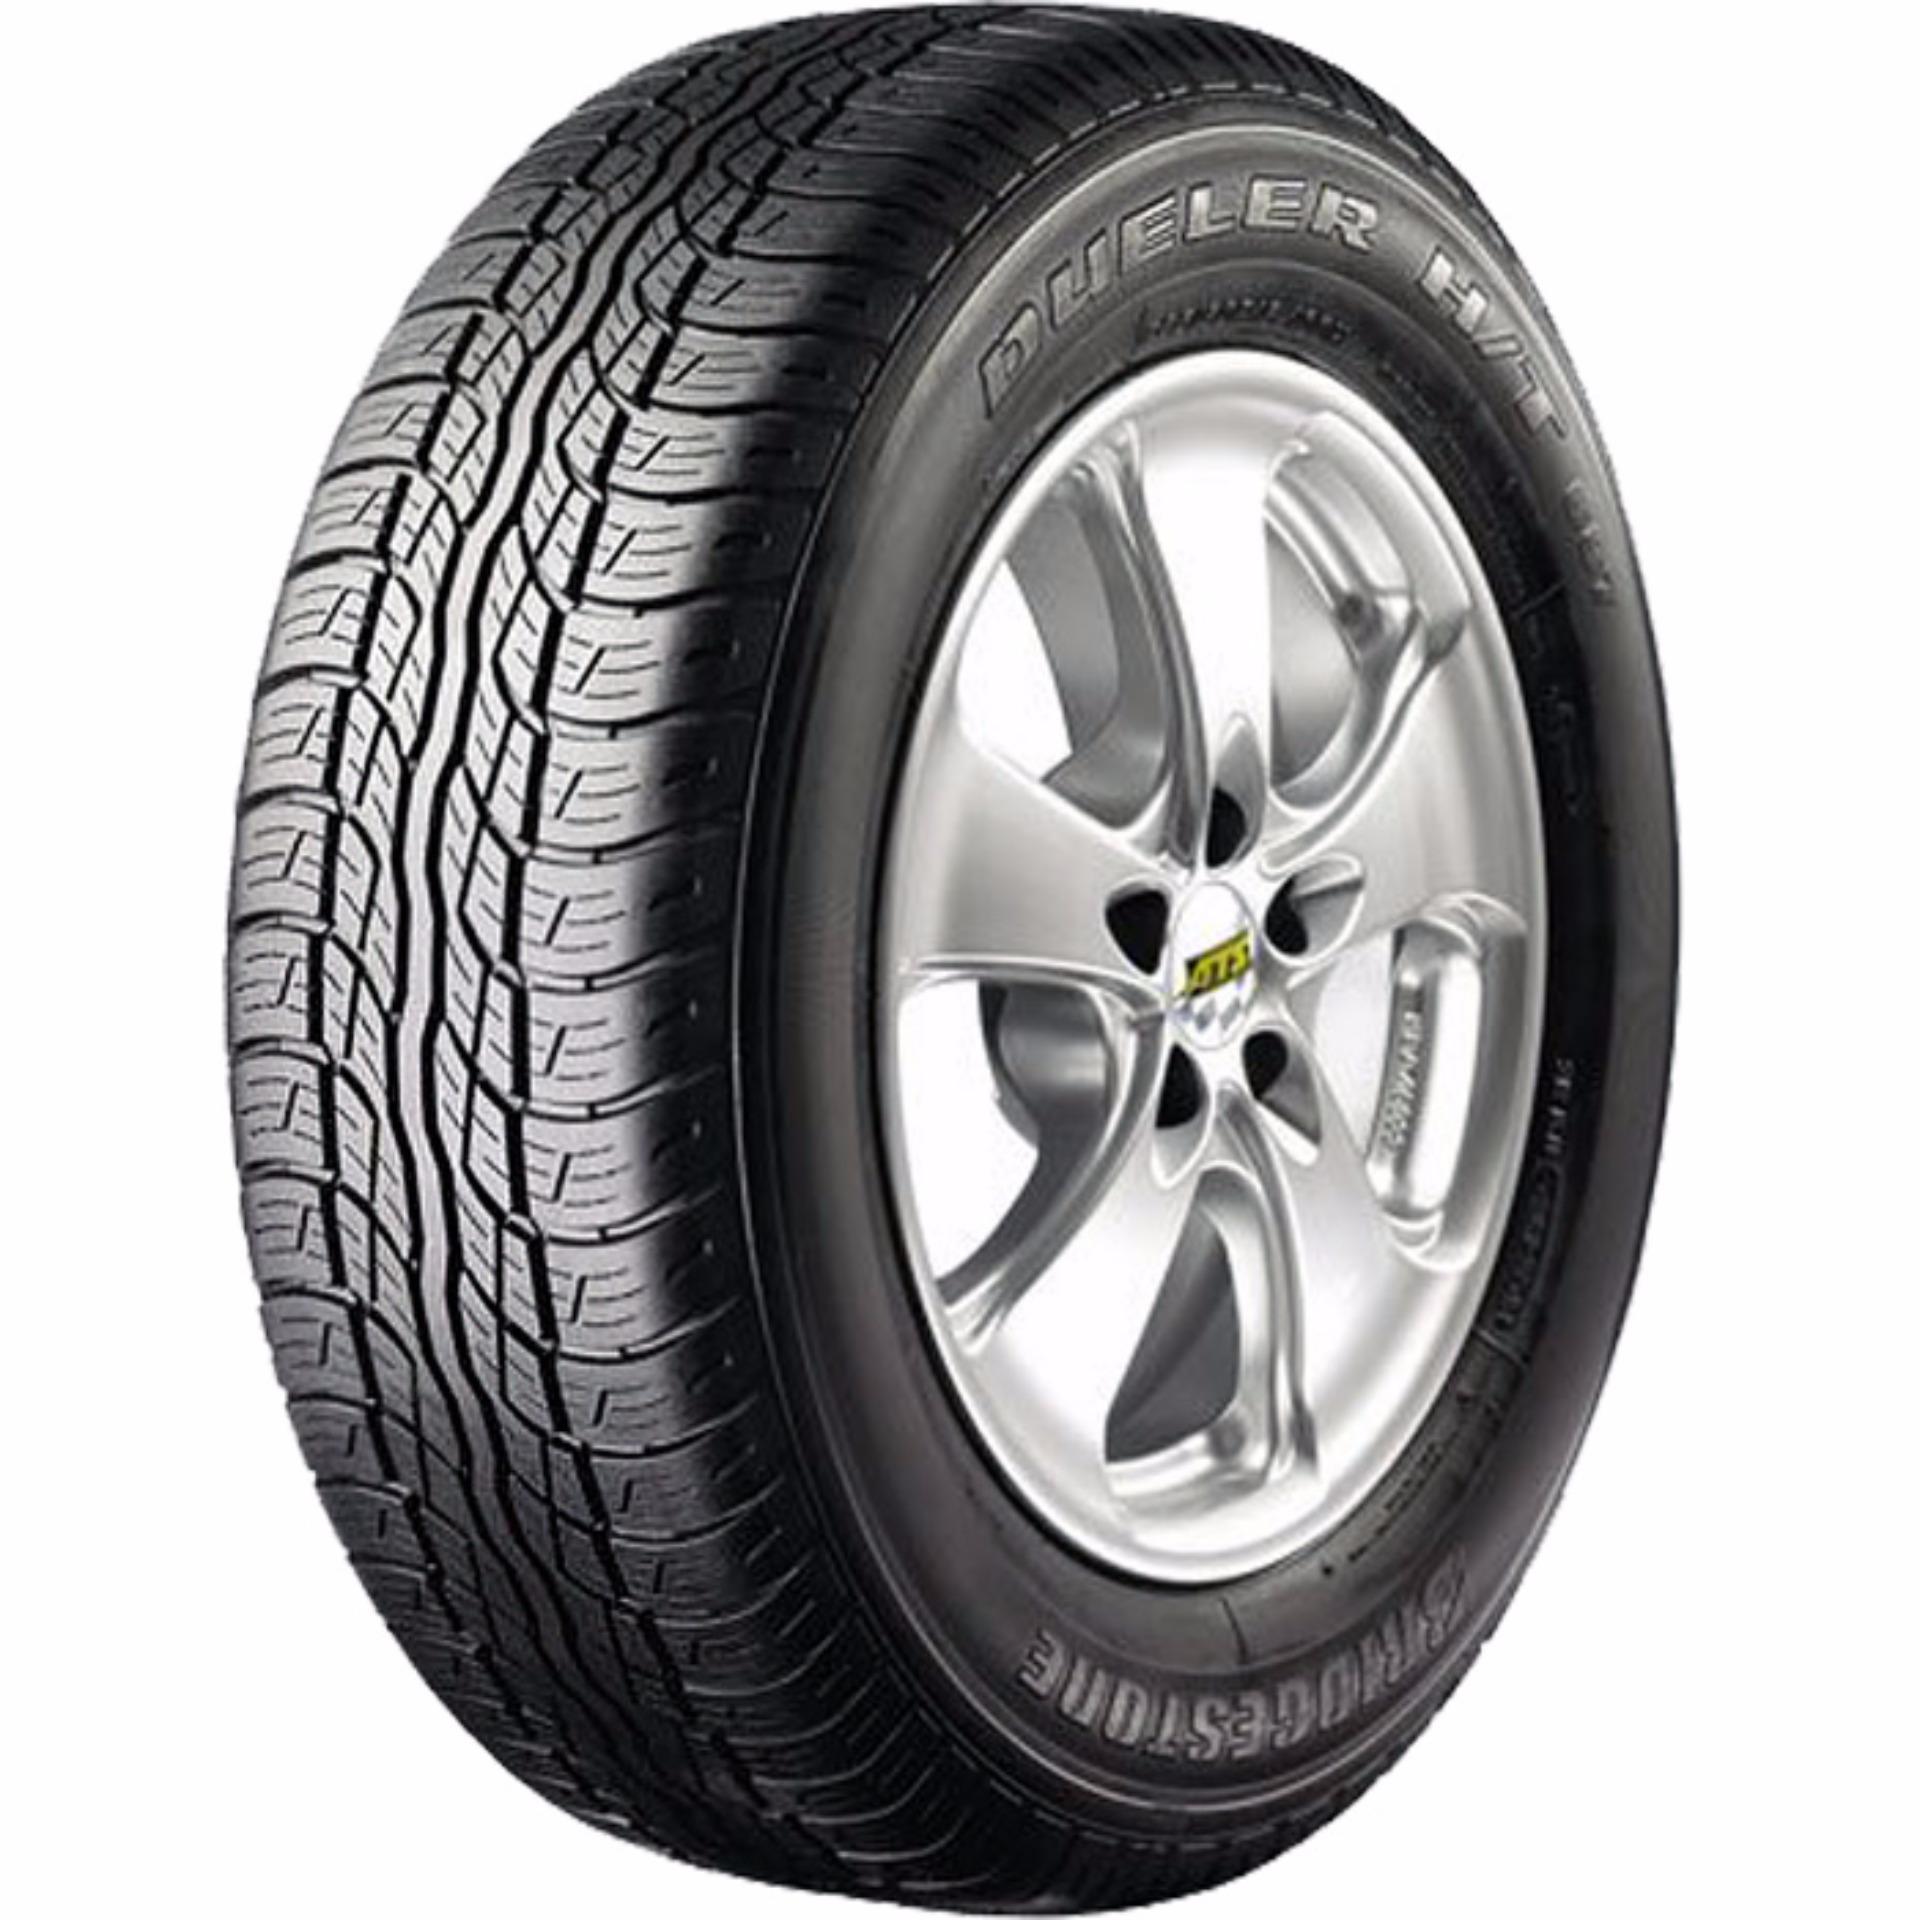 Bridgestone Dueler 687 215/60 R17 Ban Mobil - GRATIS INSTALASI